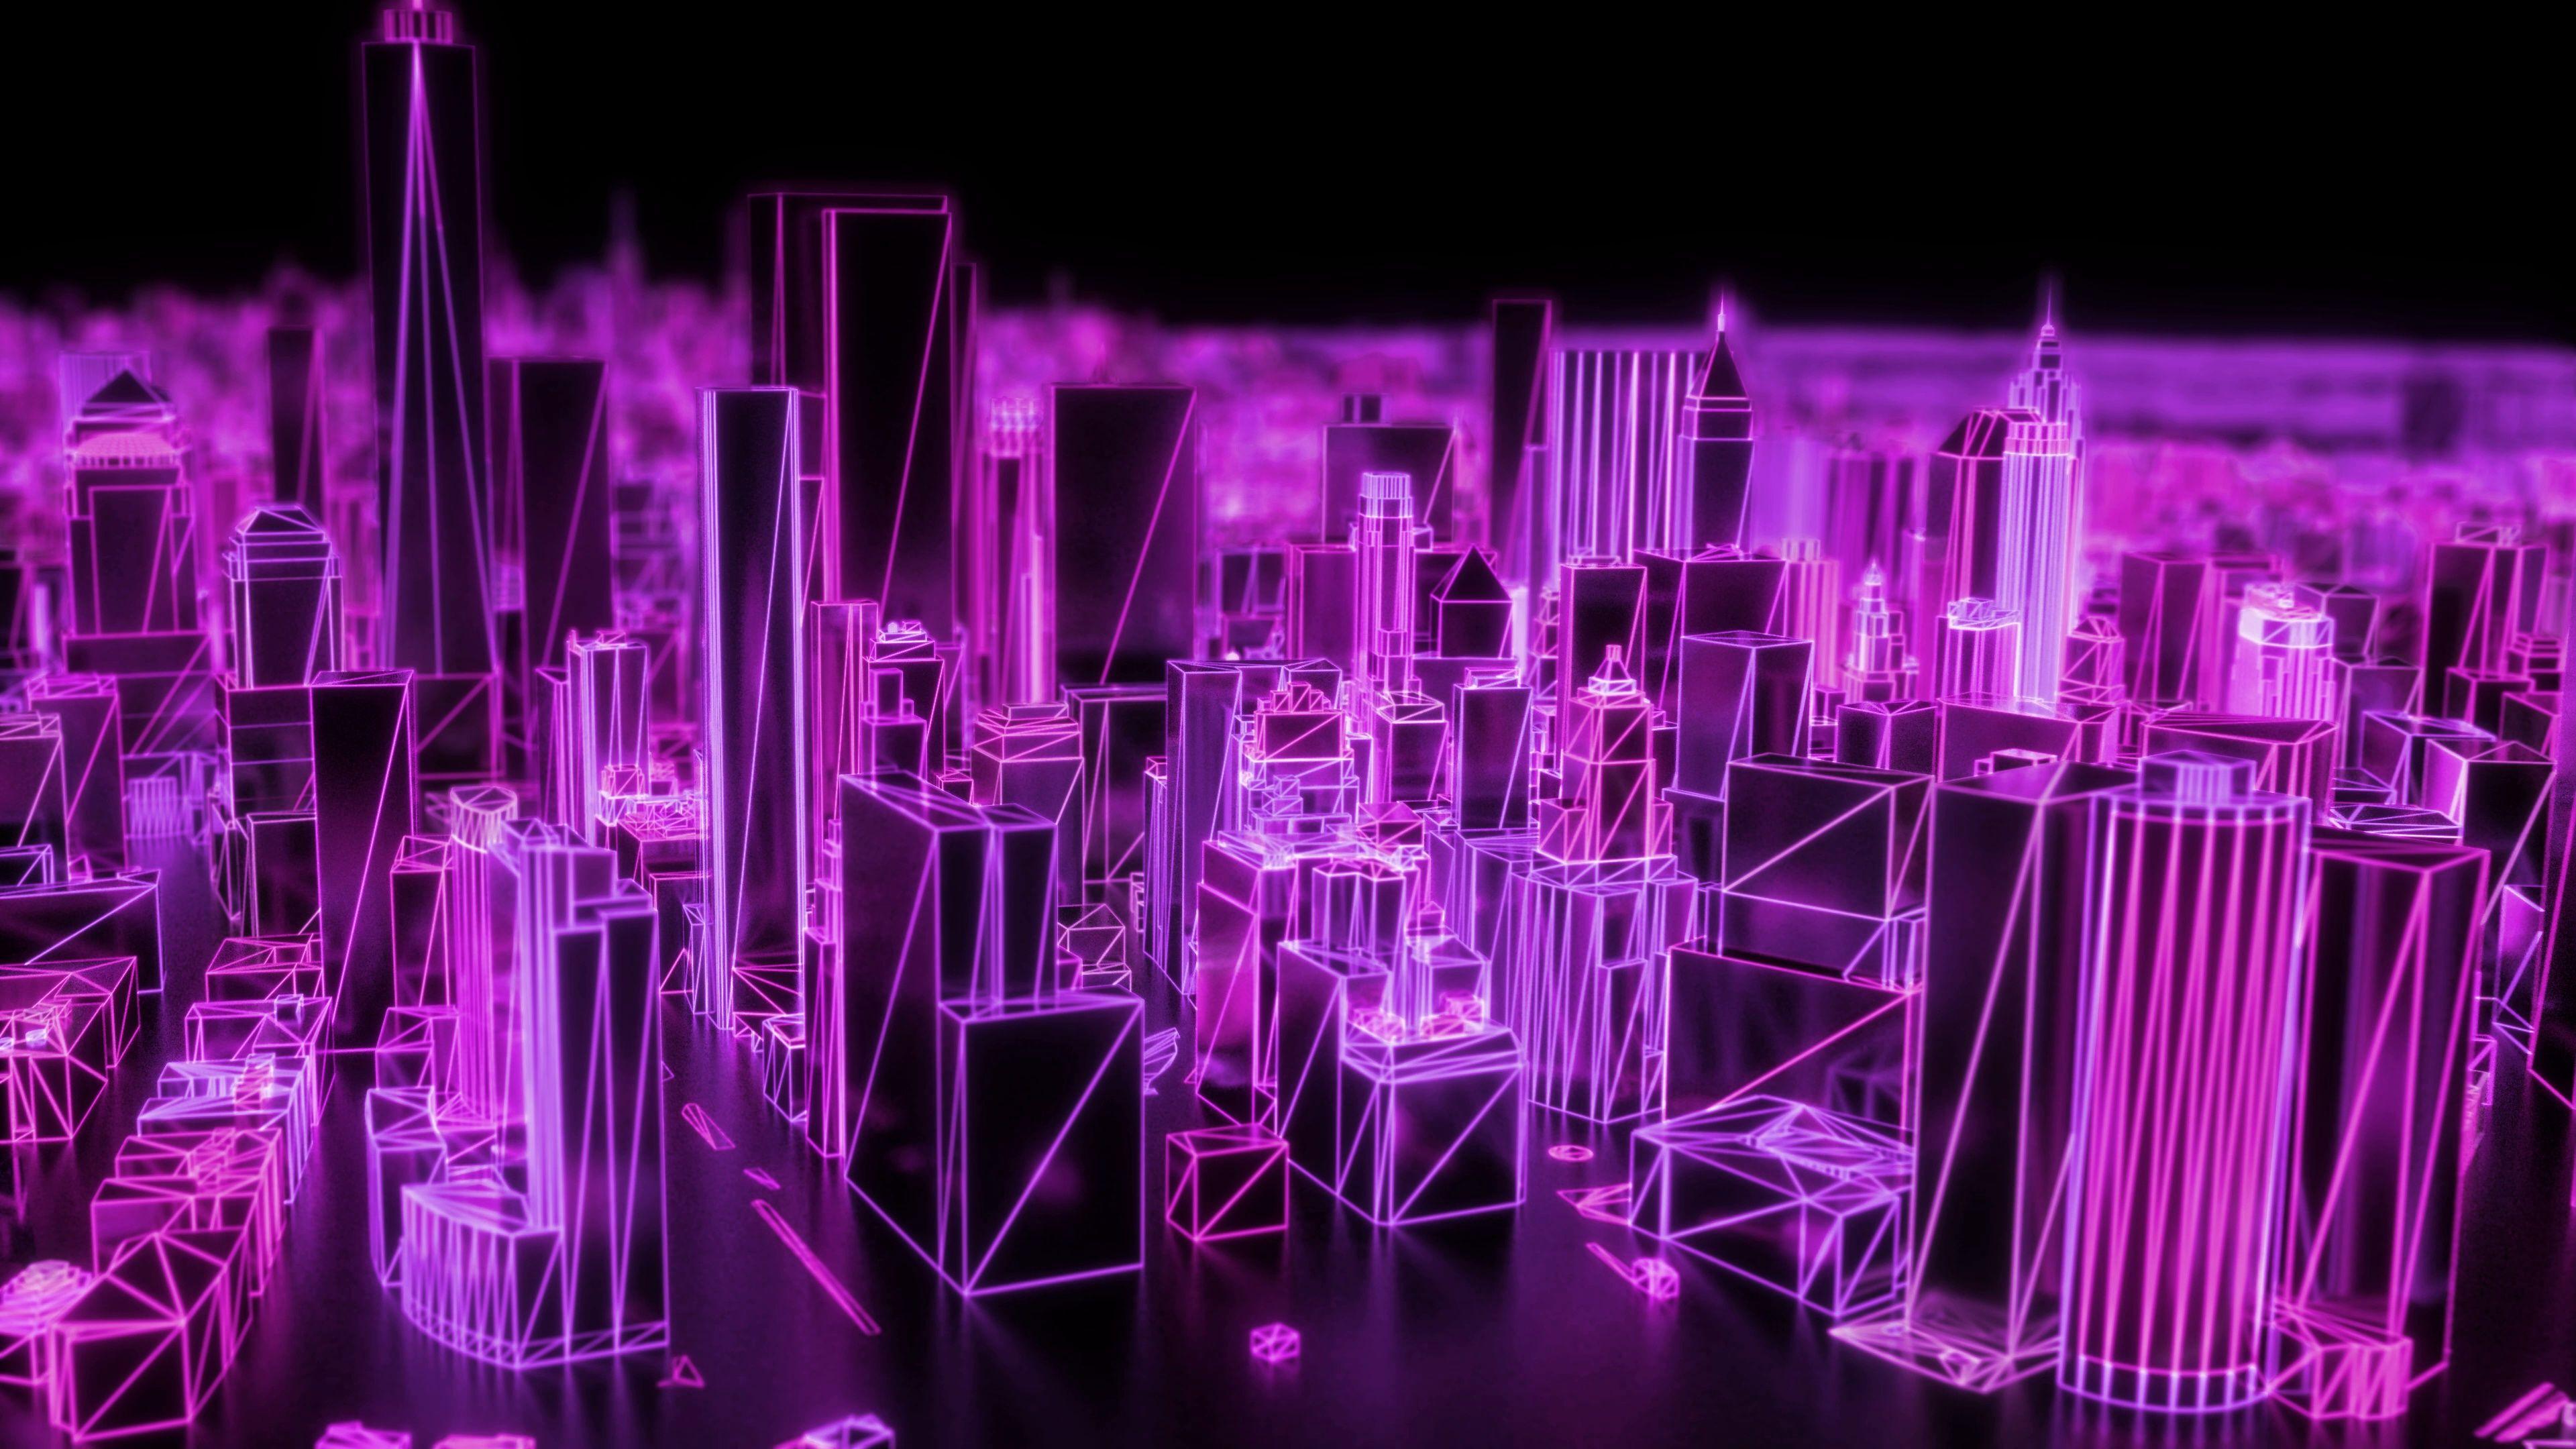 City neon glowing dof model new york nyc flyover wireframe